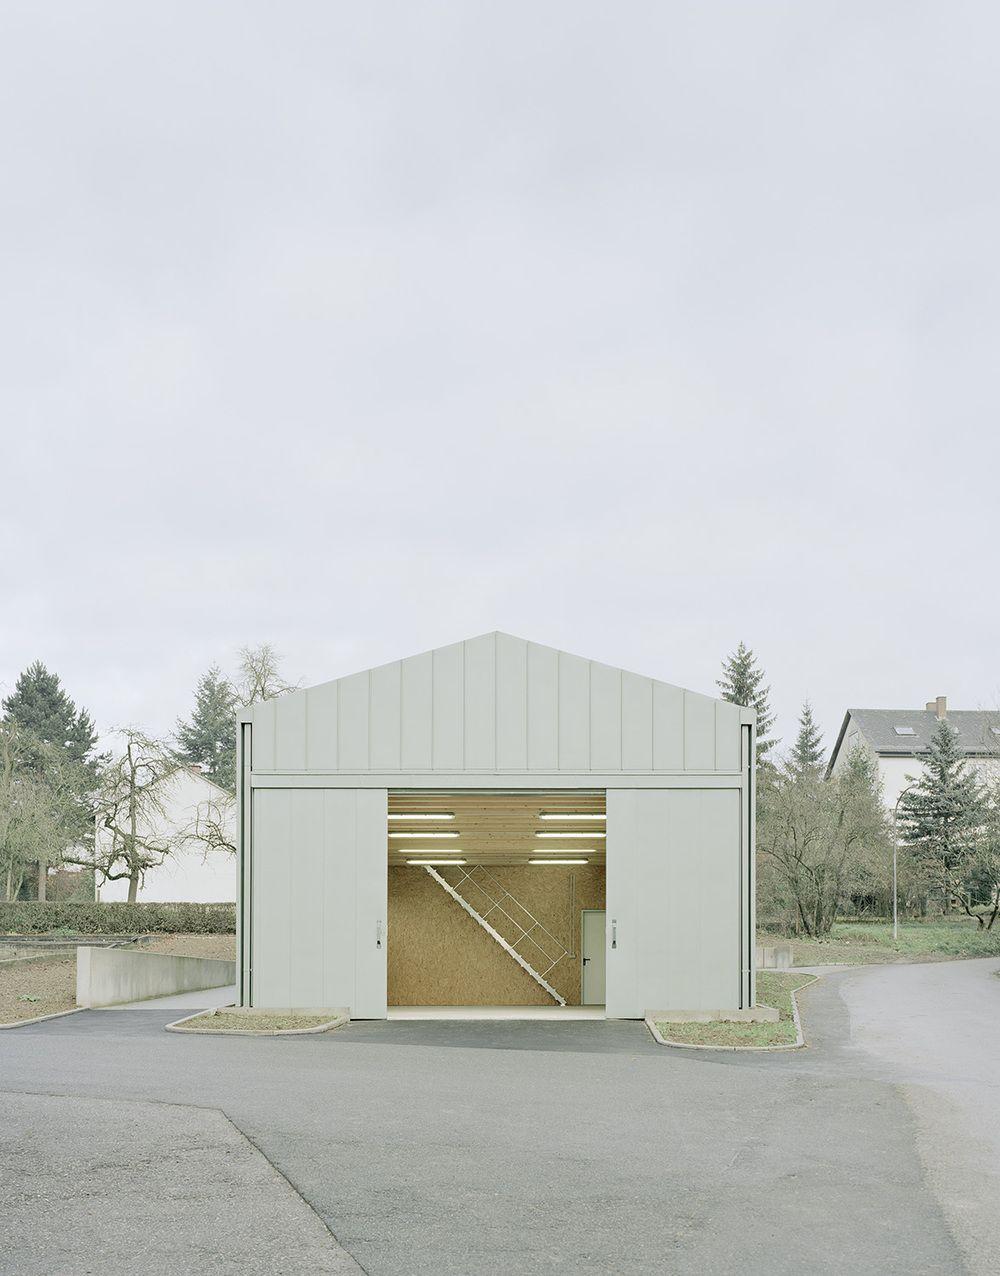 Architekturbüro Heidelberg hangar 005 jpg stuff